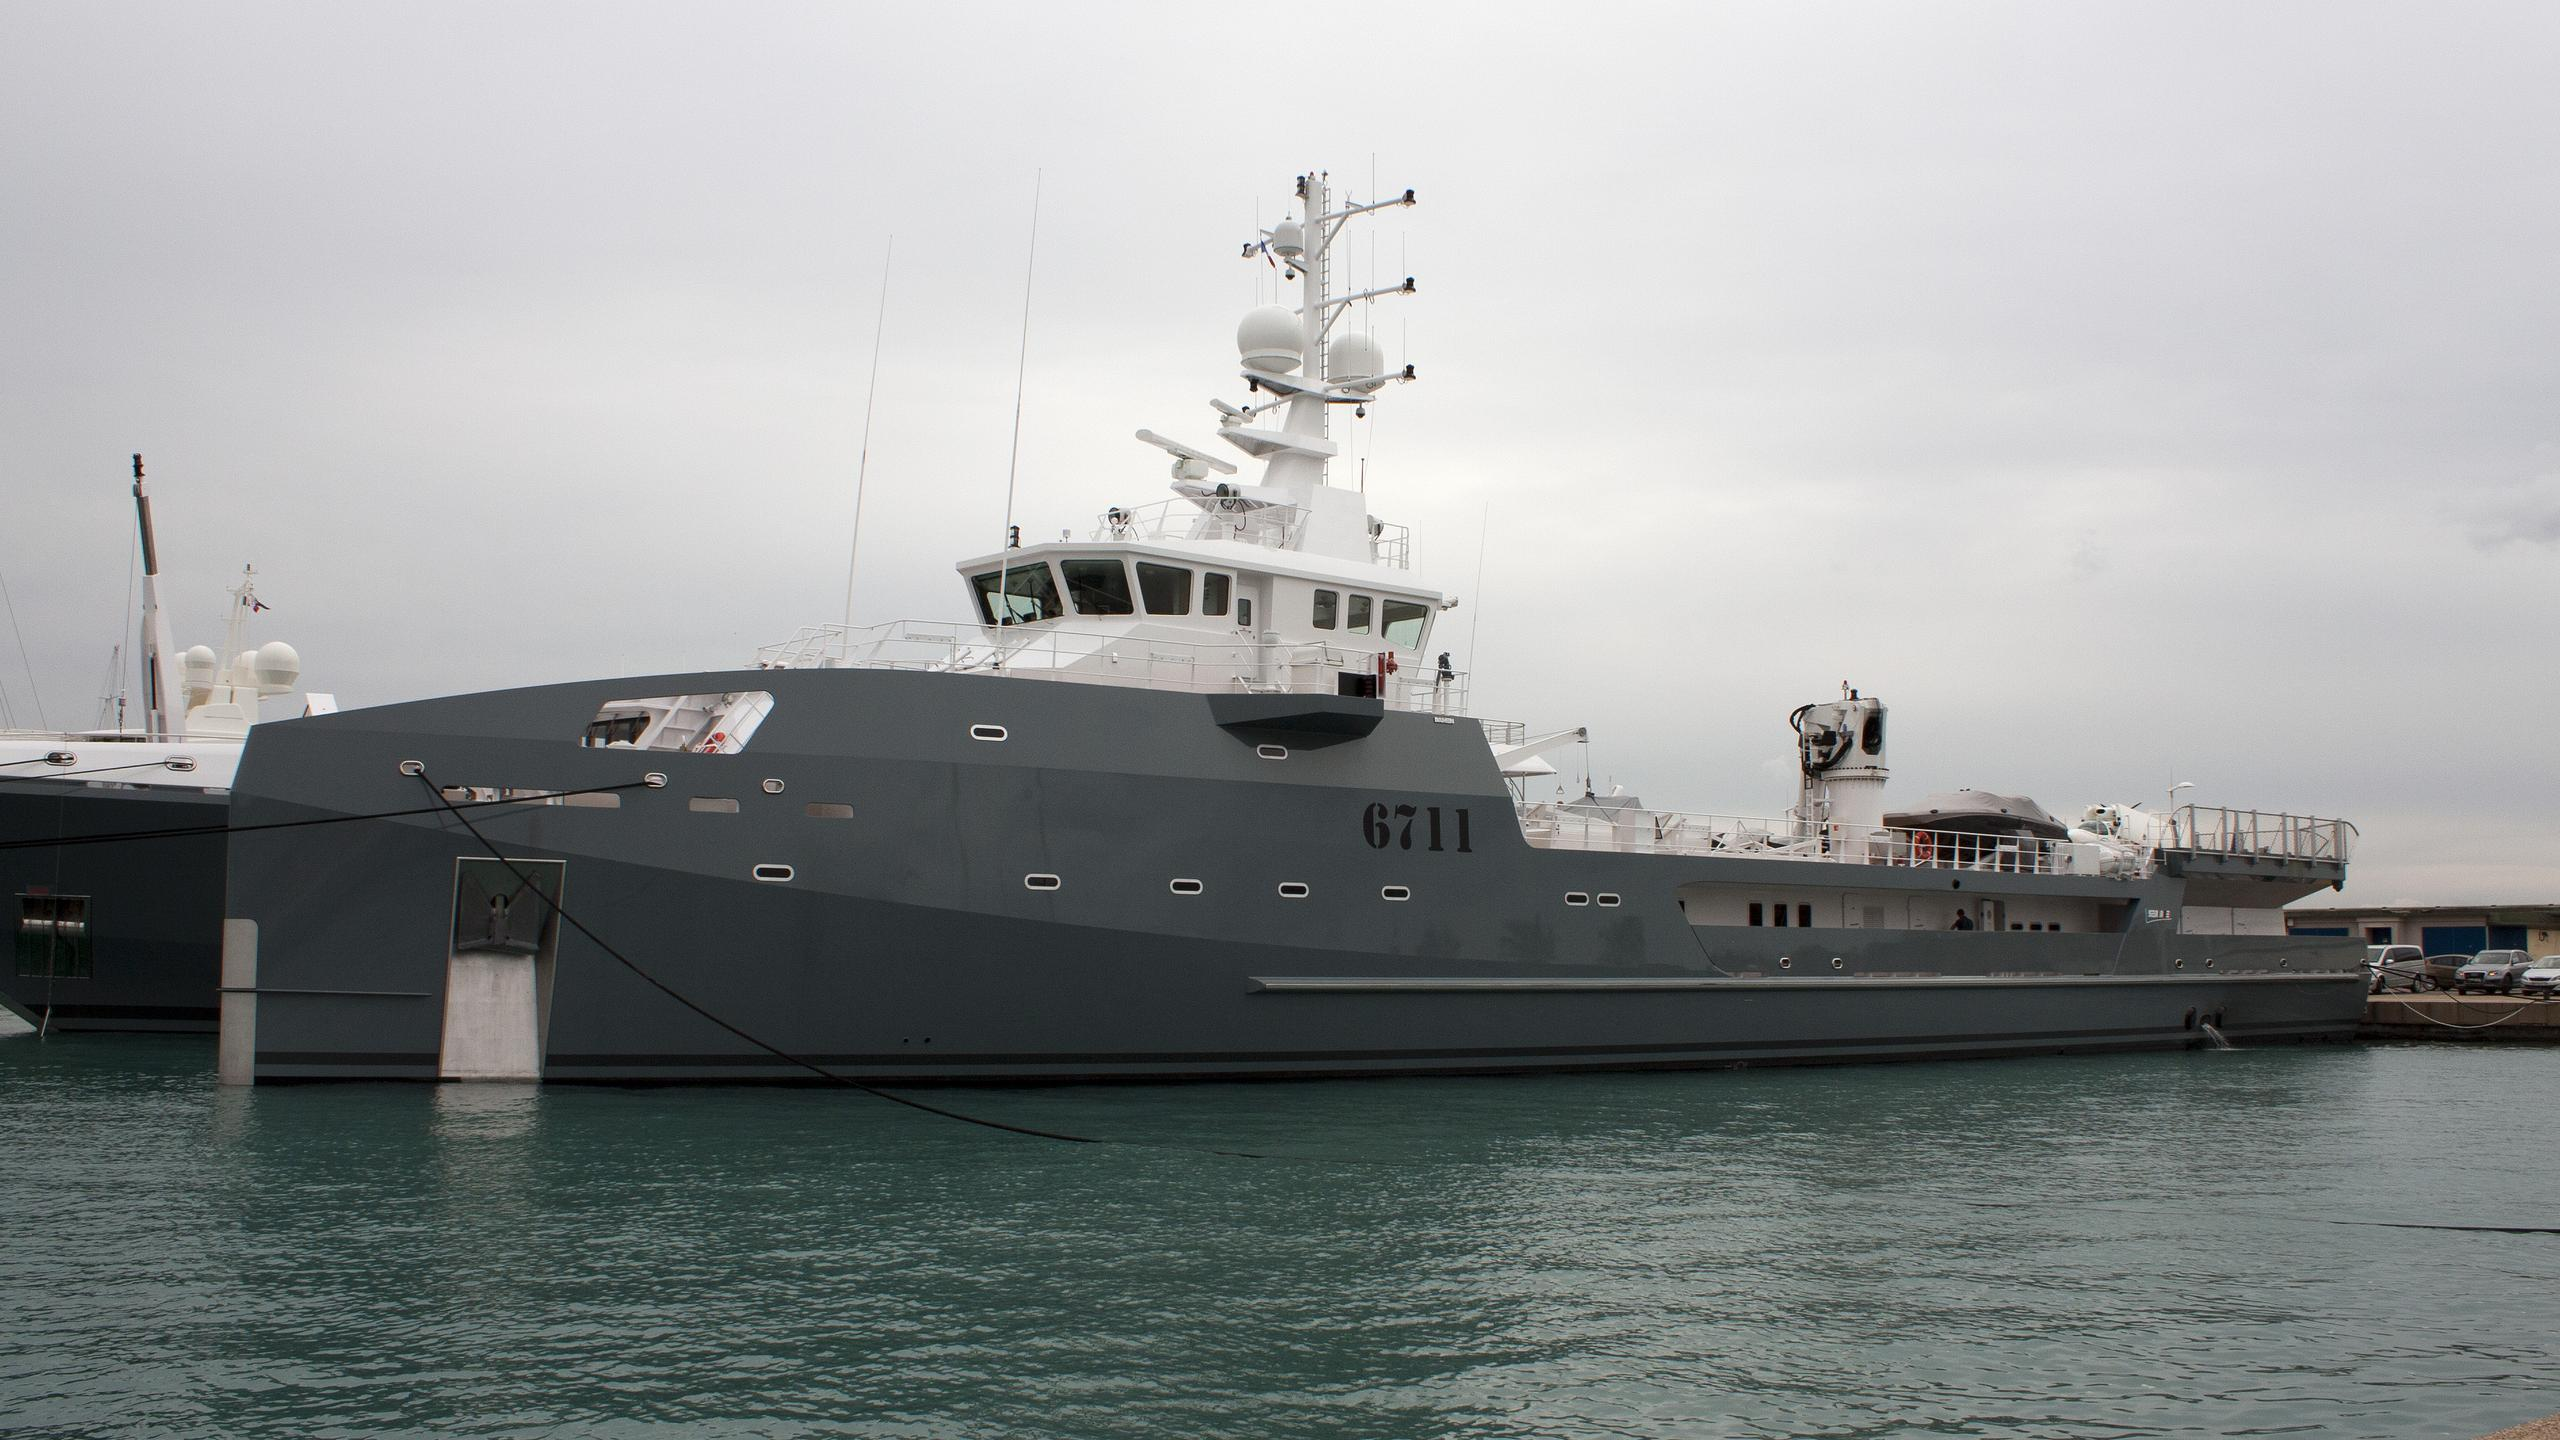 6711-yacht-exterior